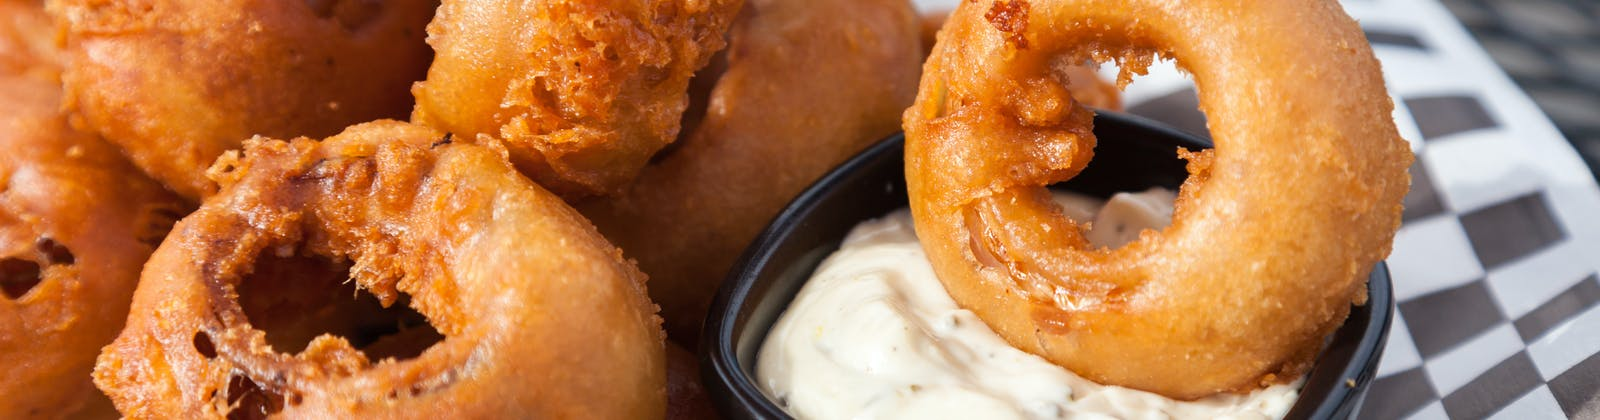 onion rings with aioli sauce